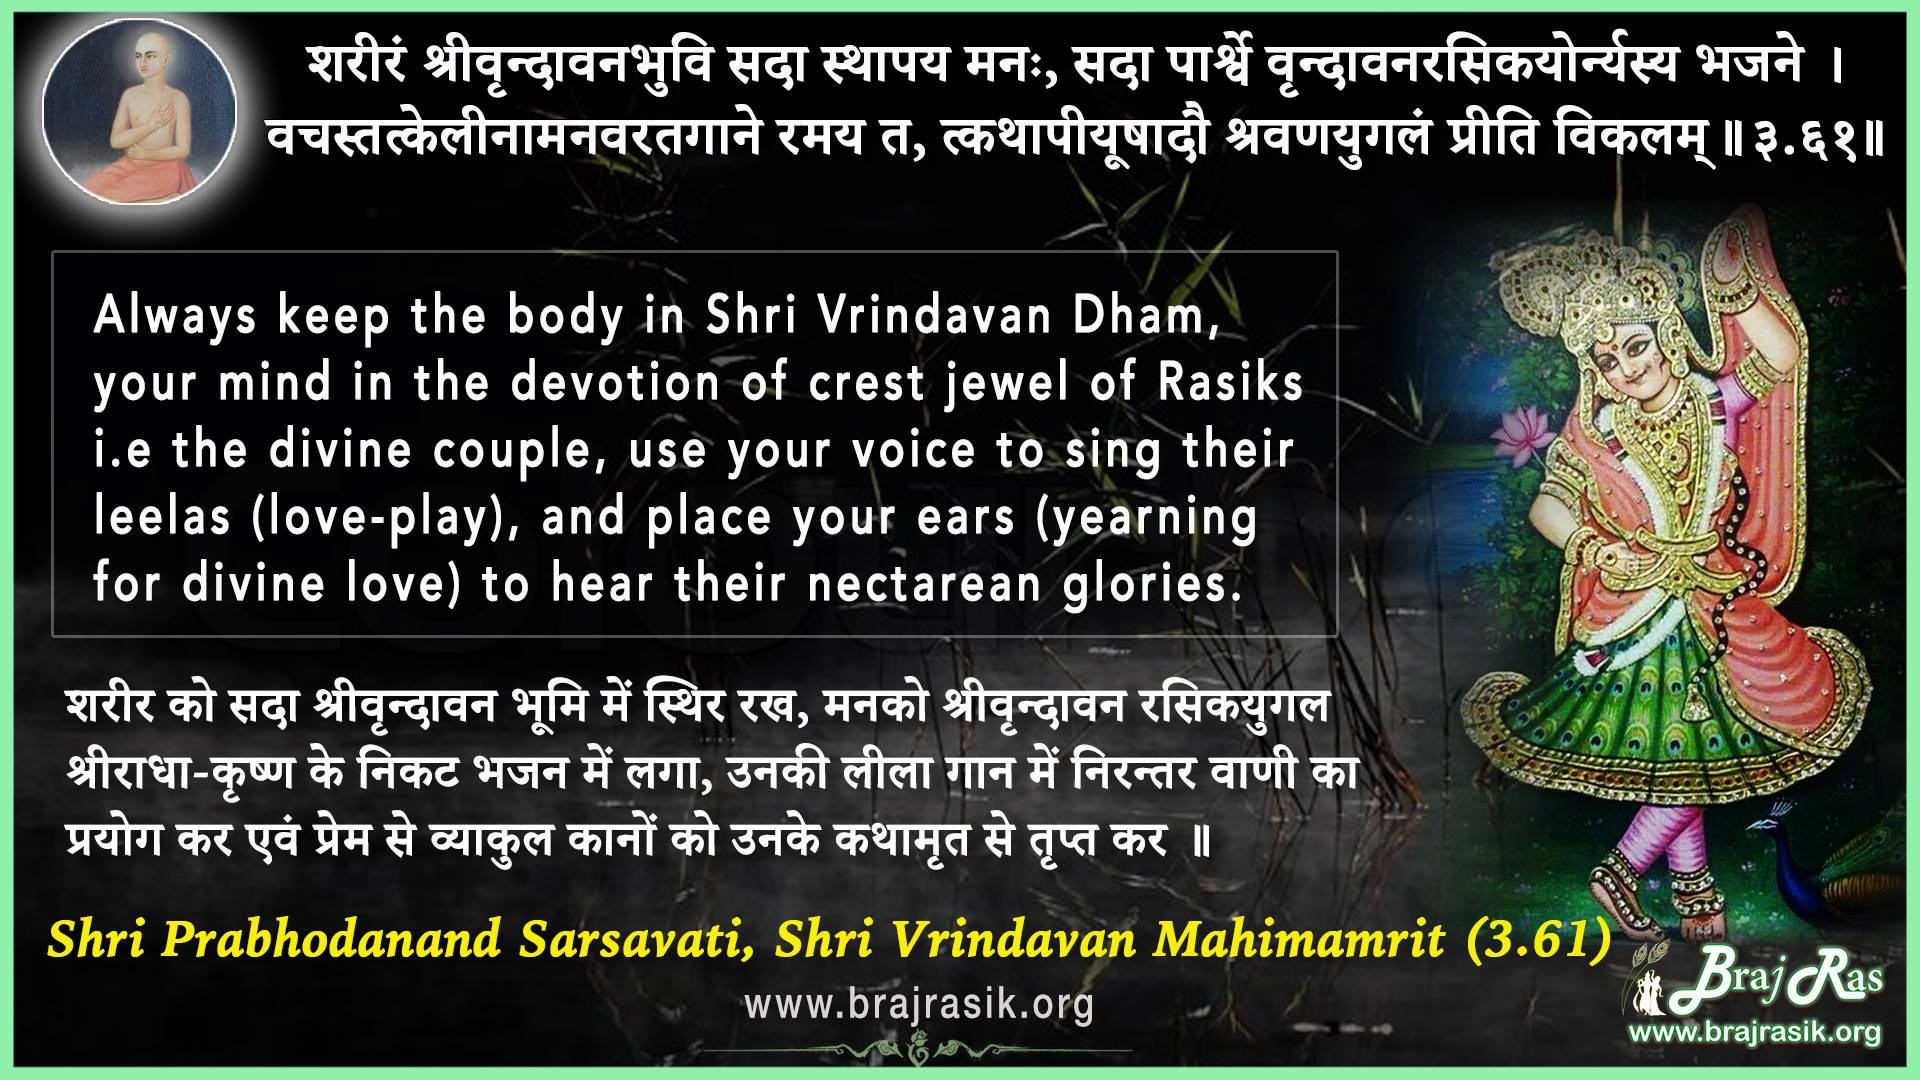 Shareeram Shri Vrindavanbhumi - Vrindavan Mahimamrit (3.61)